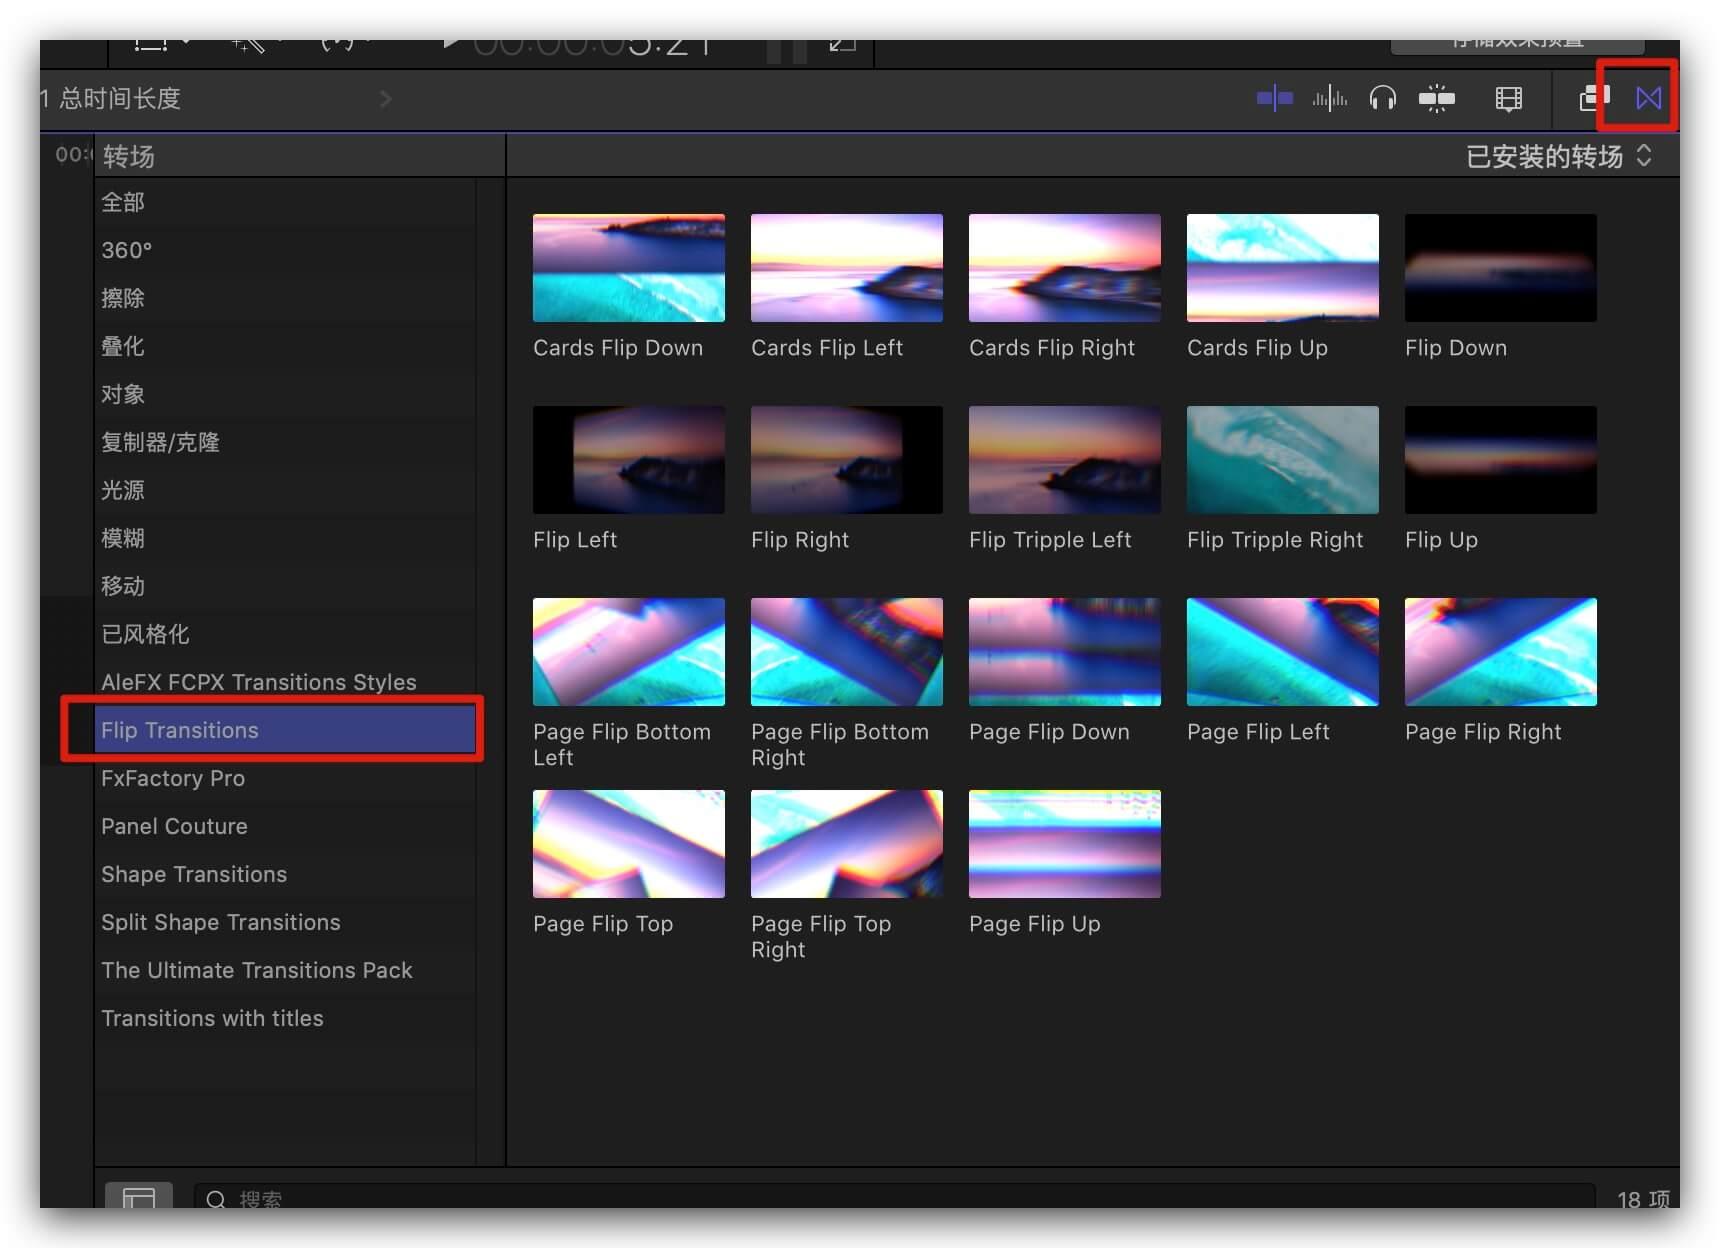 fcpx转场插件 18组4K翻转翻页转场效果预设 Flip Transitions